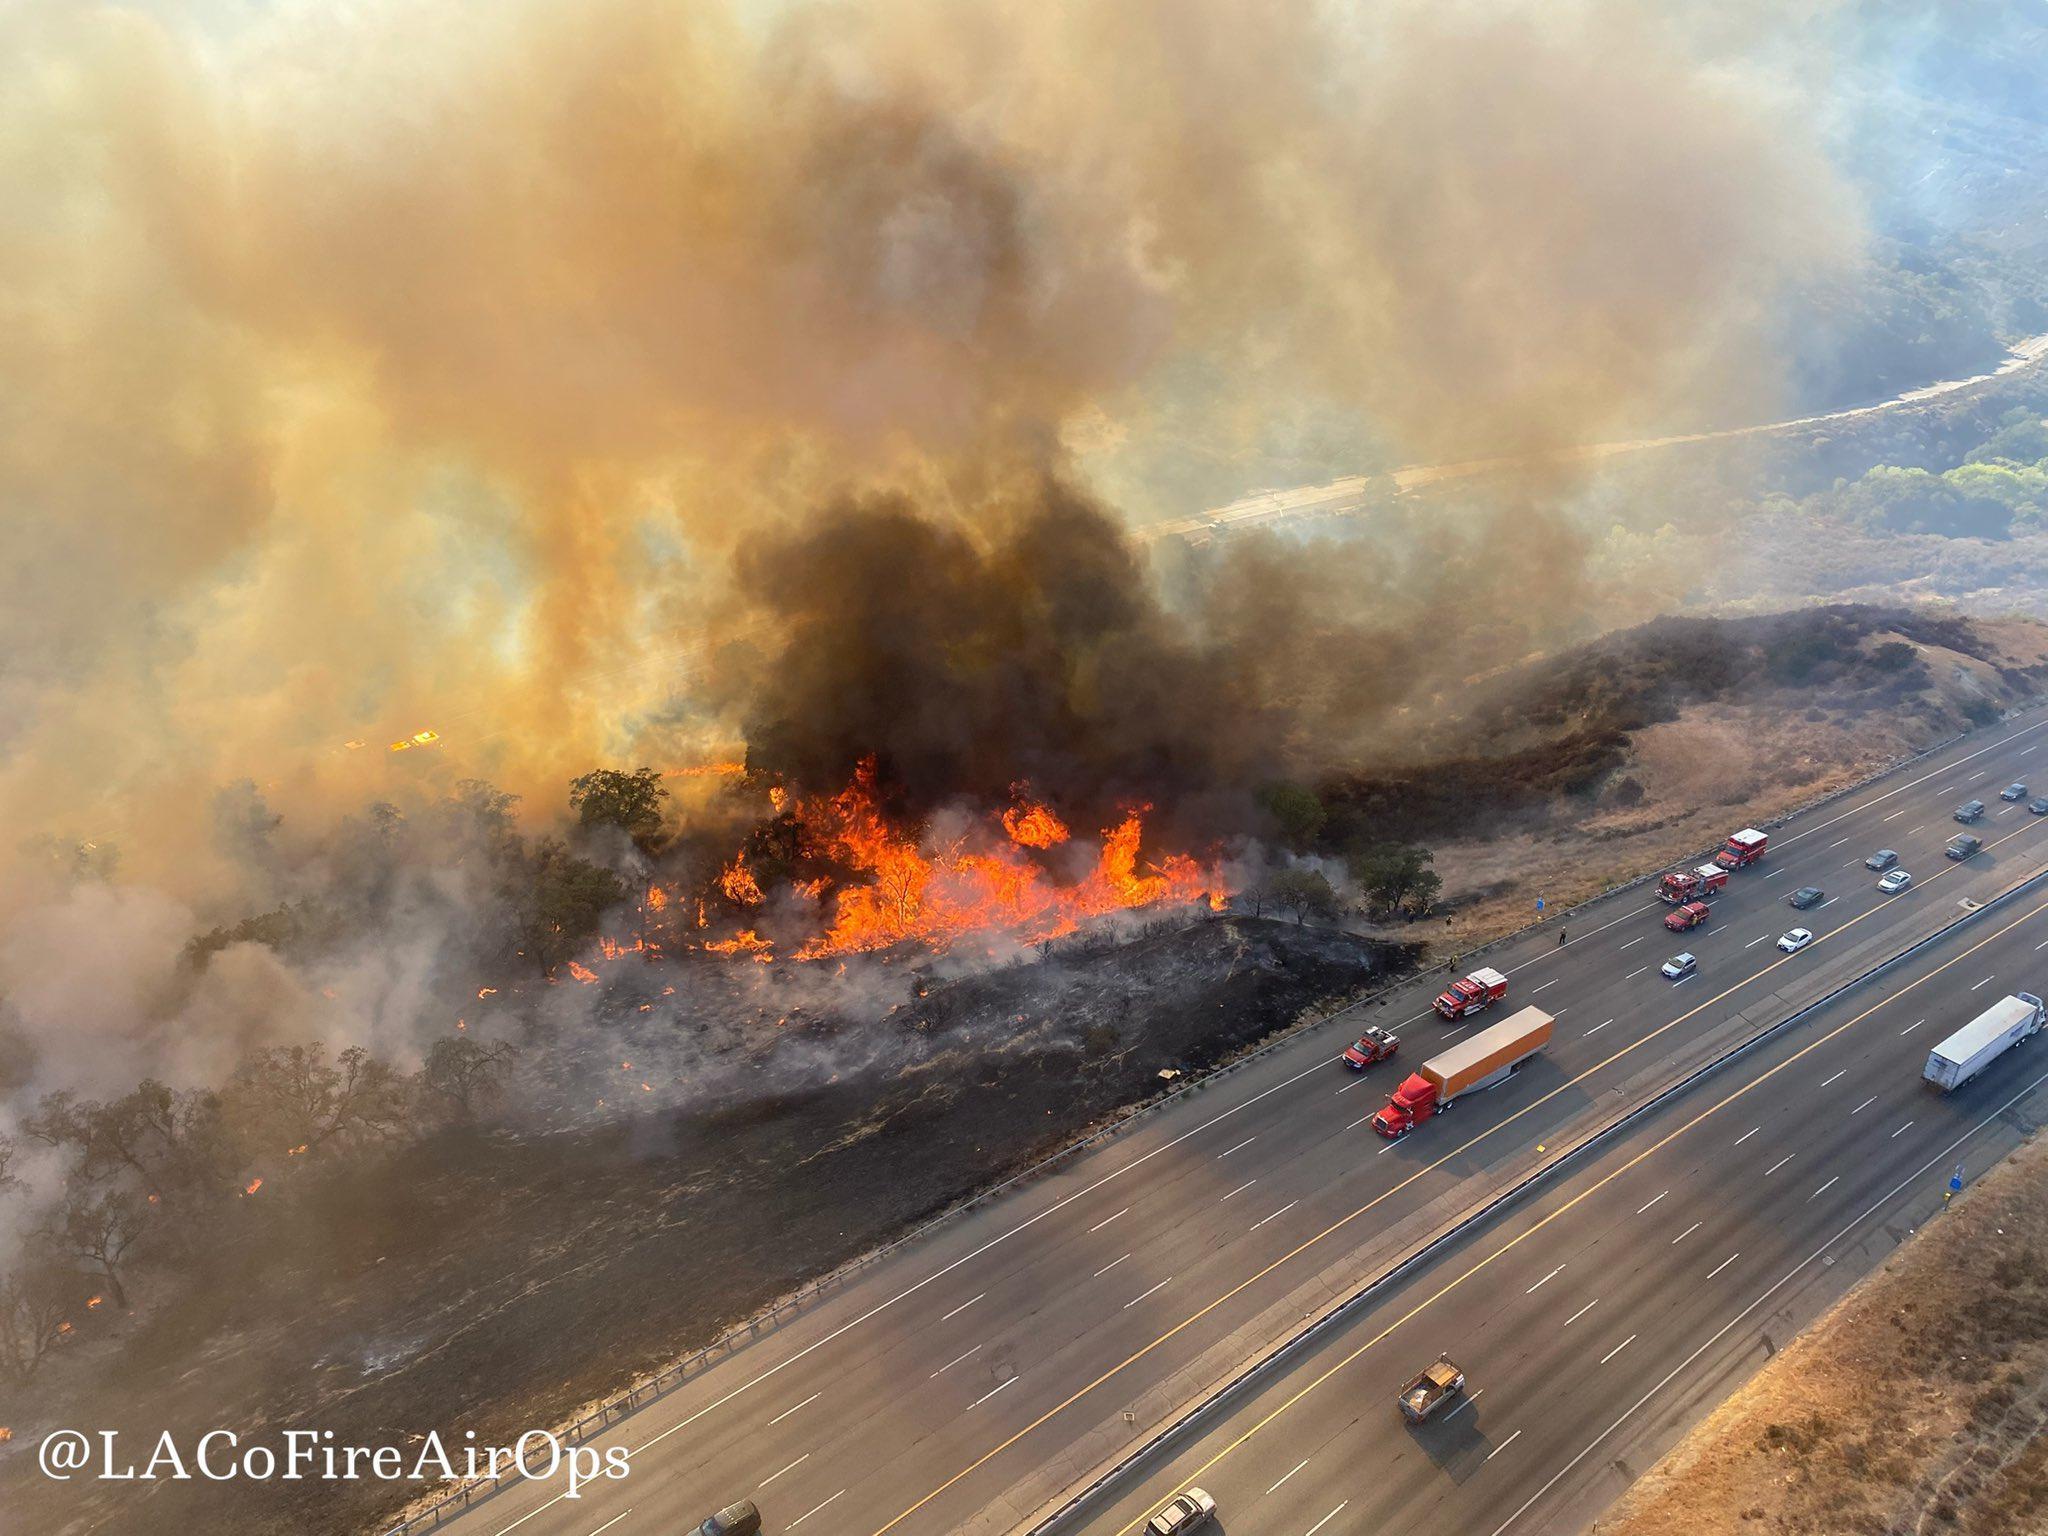 Firefighters advance on blaze that shut California highway